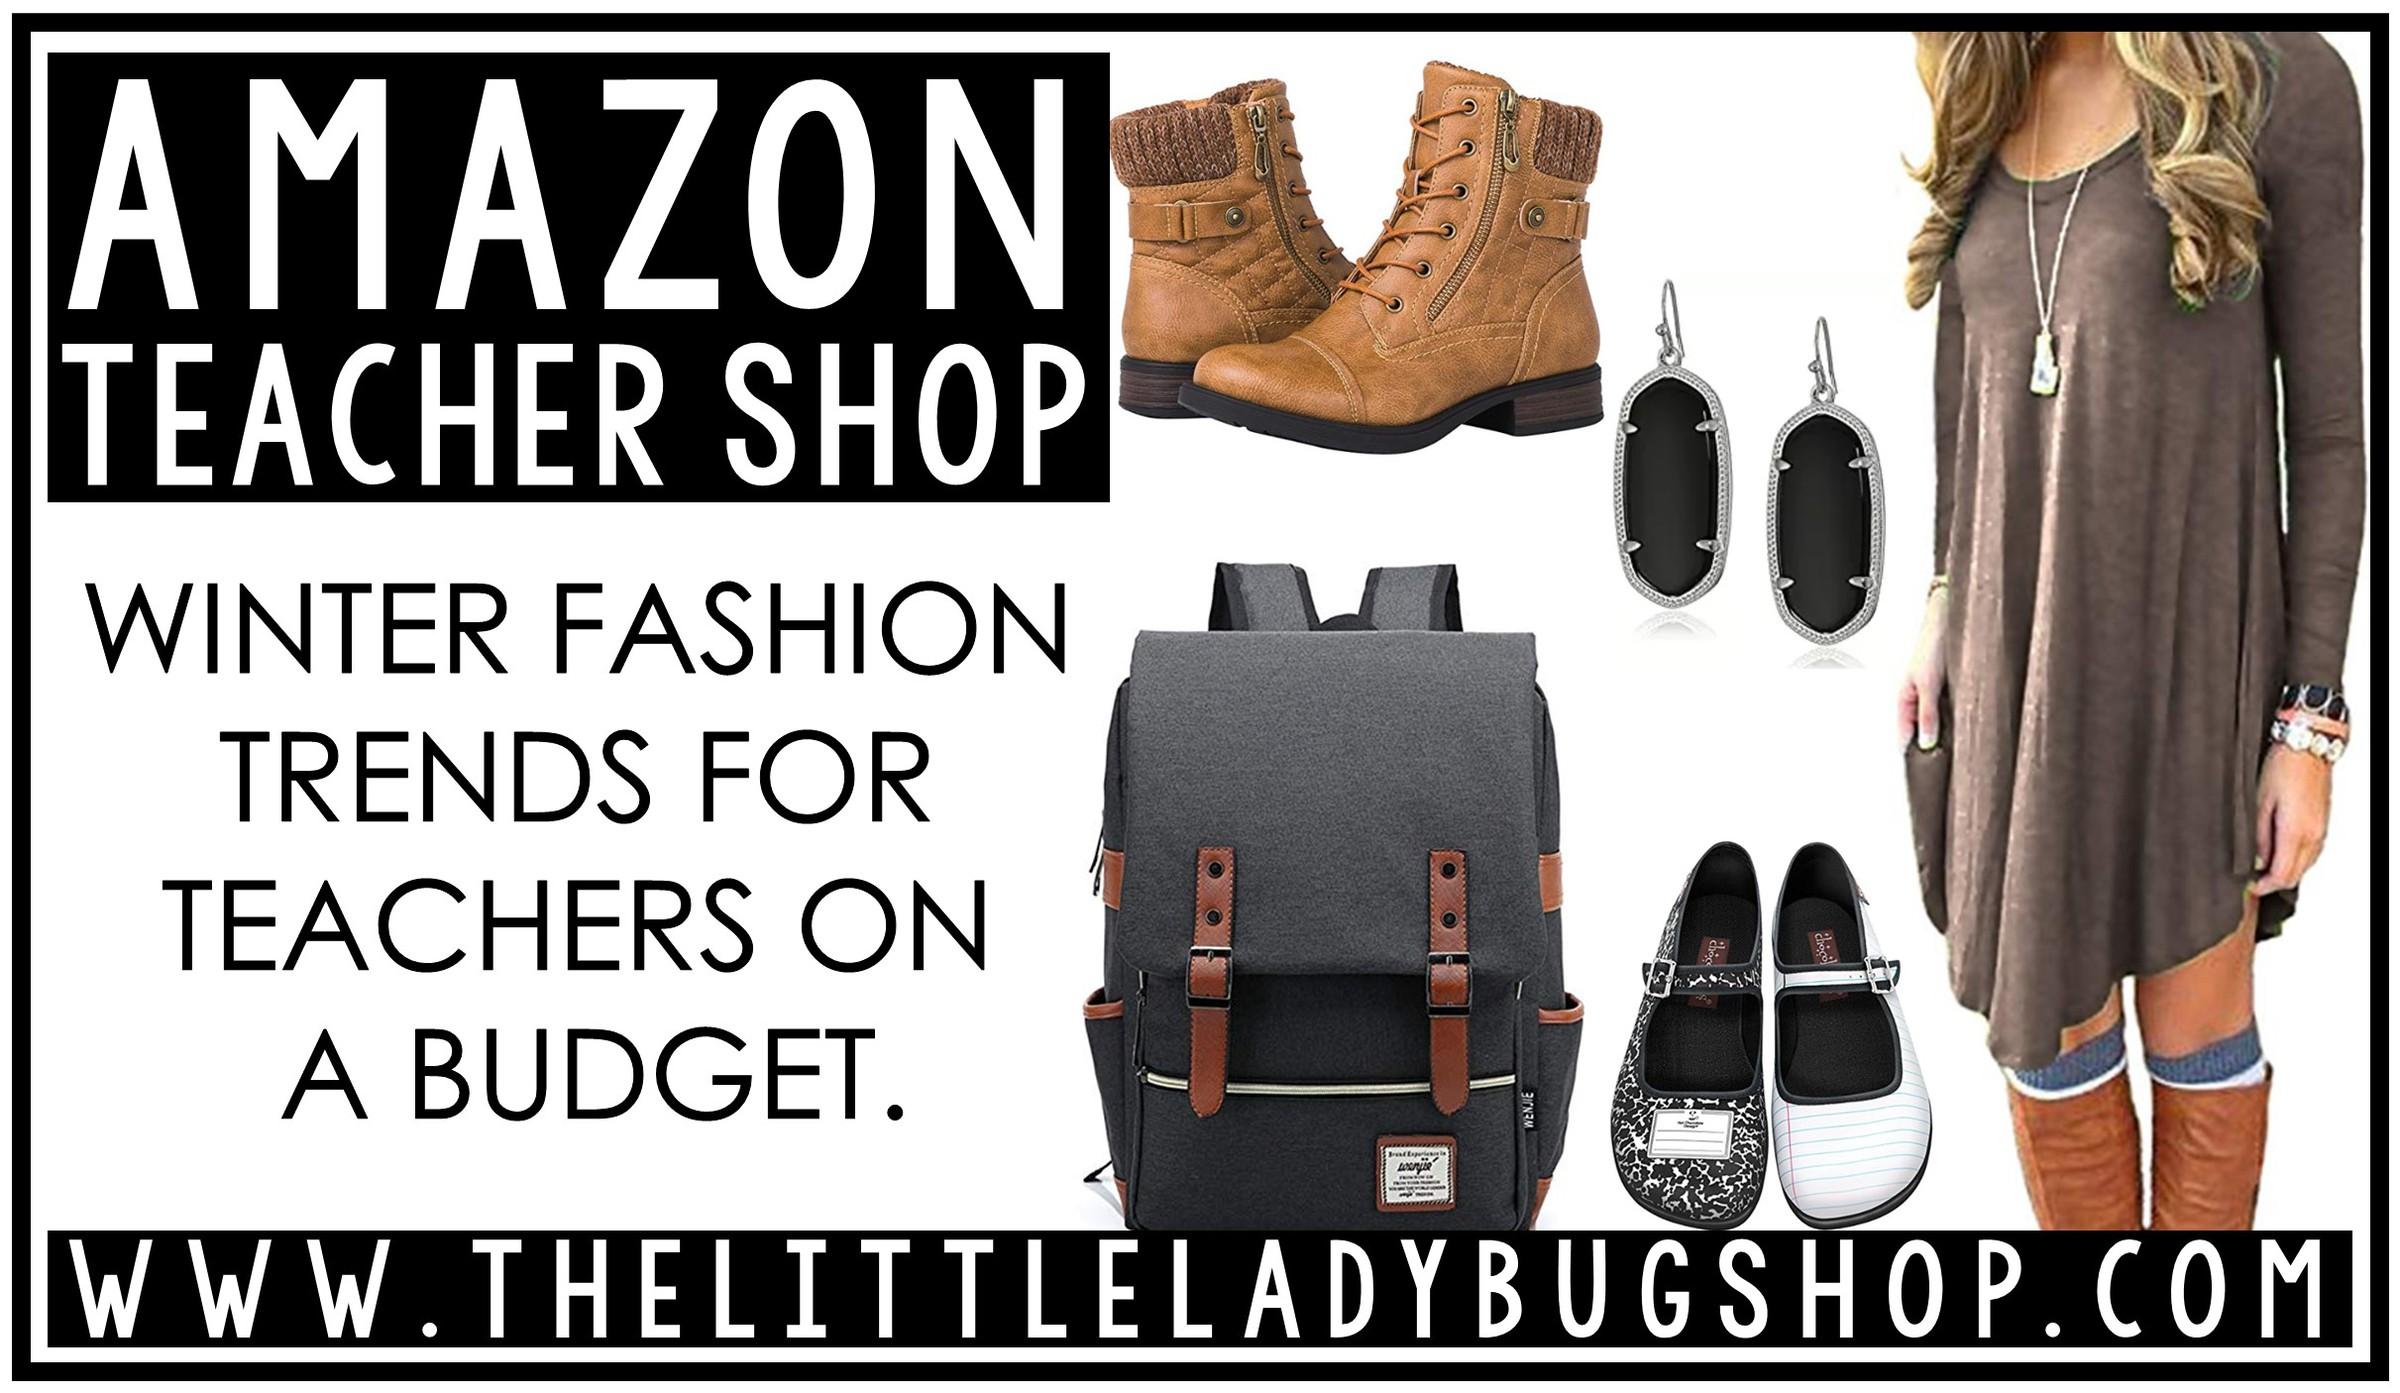 Top Amazon Teacher Fashion Trends